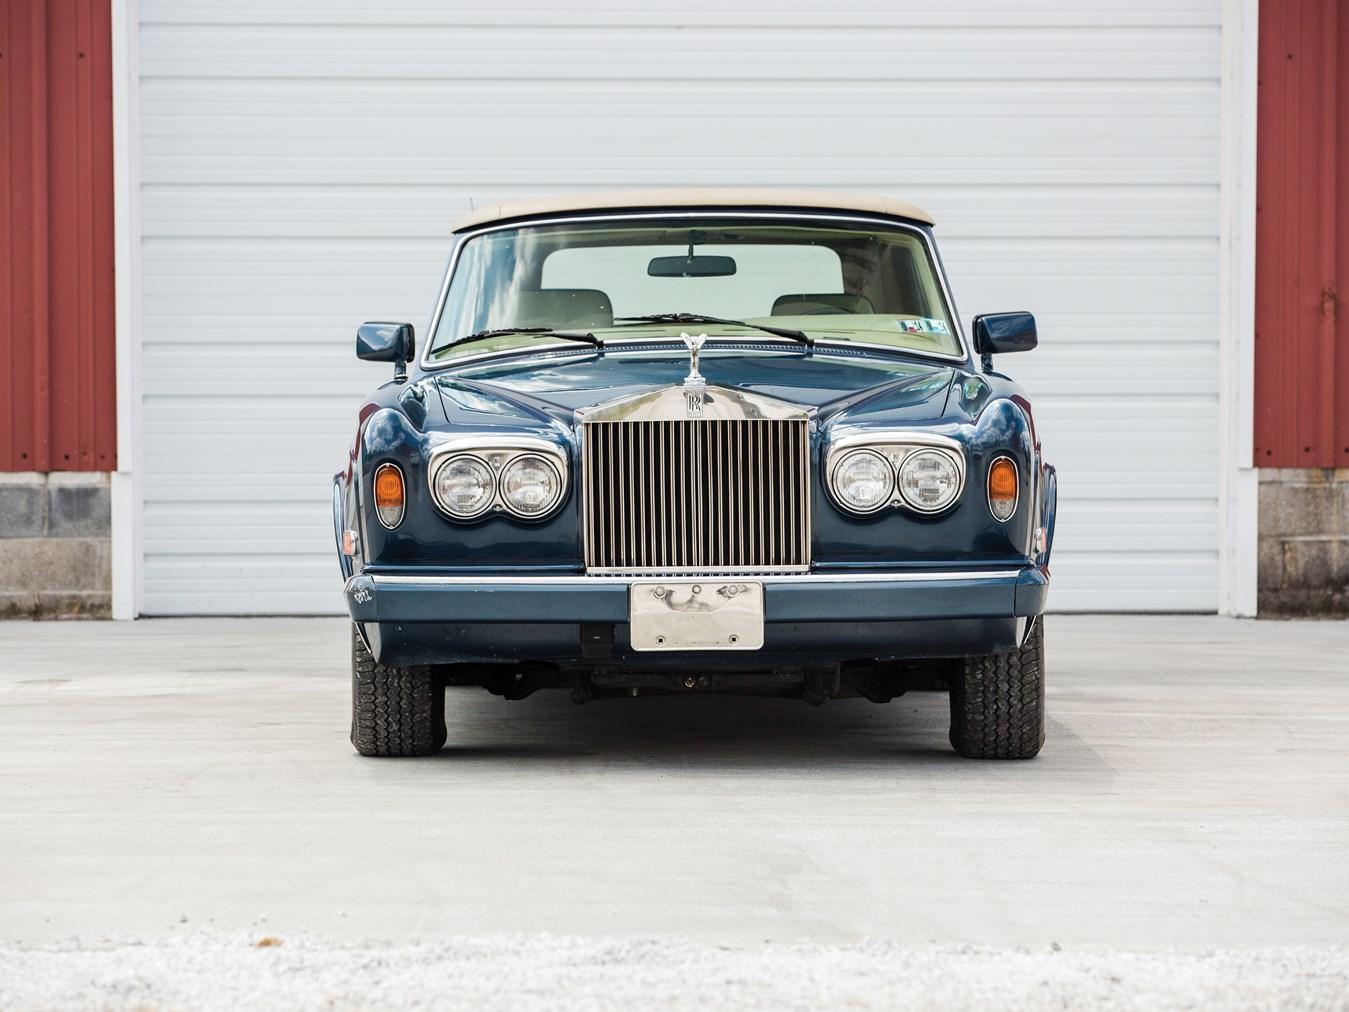 1985 Rolls-Royce Corniche Drophead Coupe front